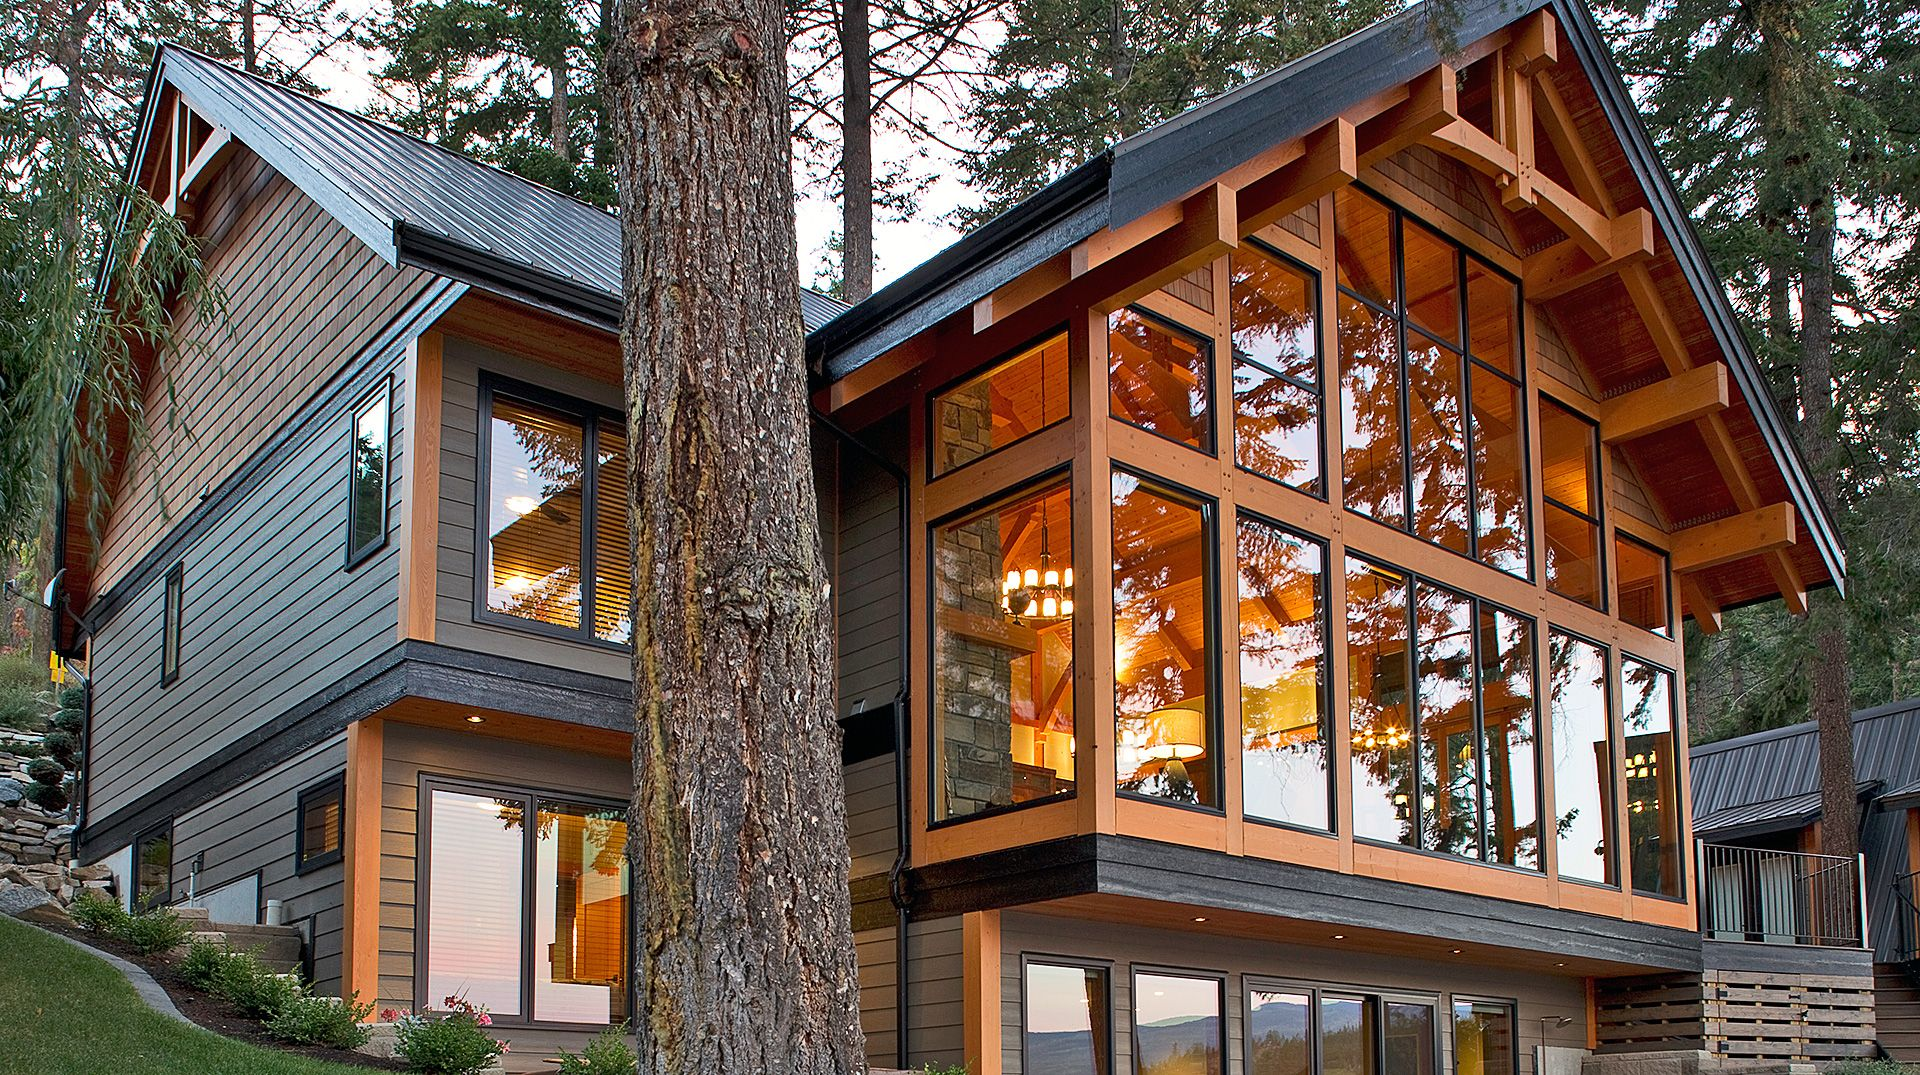 Little Shuswap Chalet Stone Cottages Architecture Lake Cabins